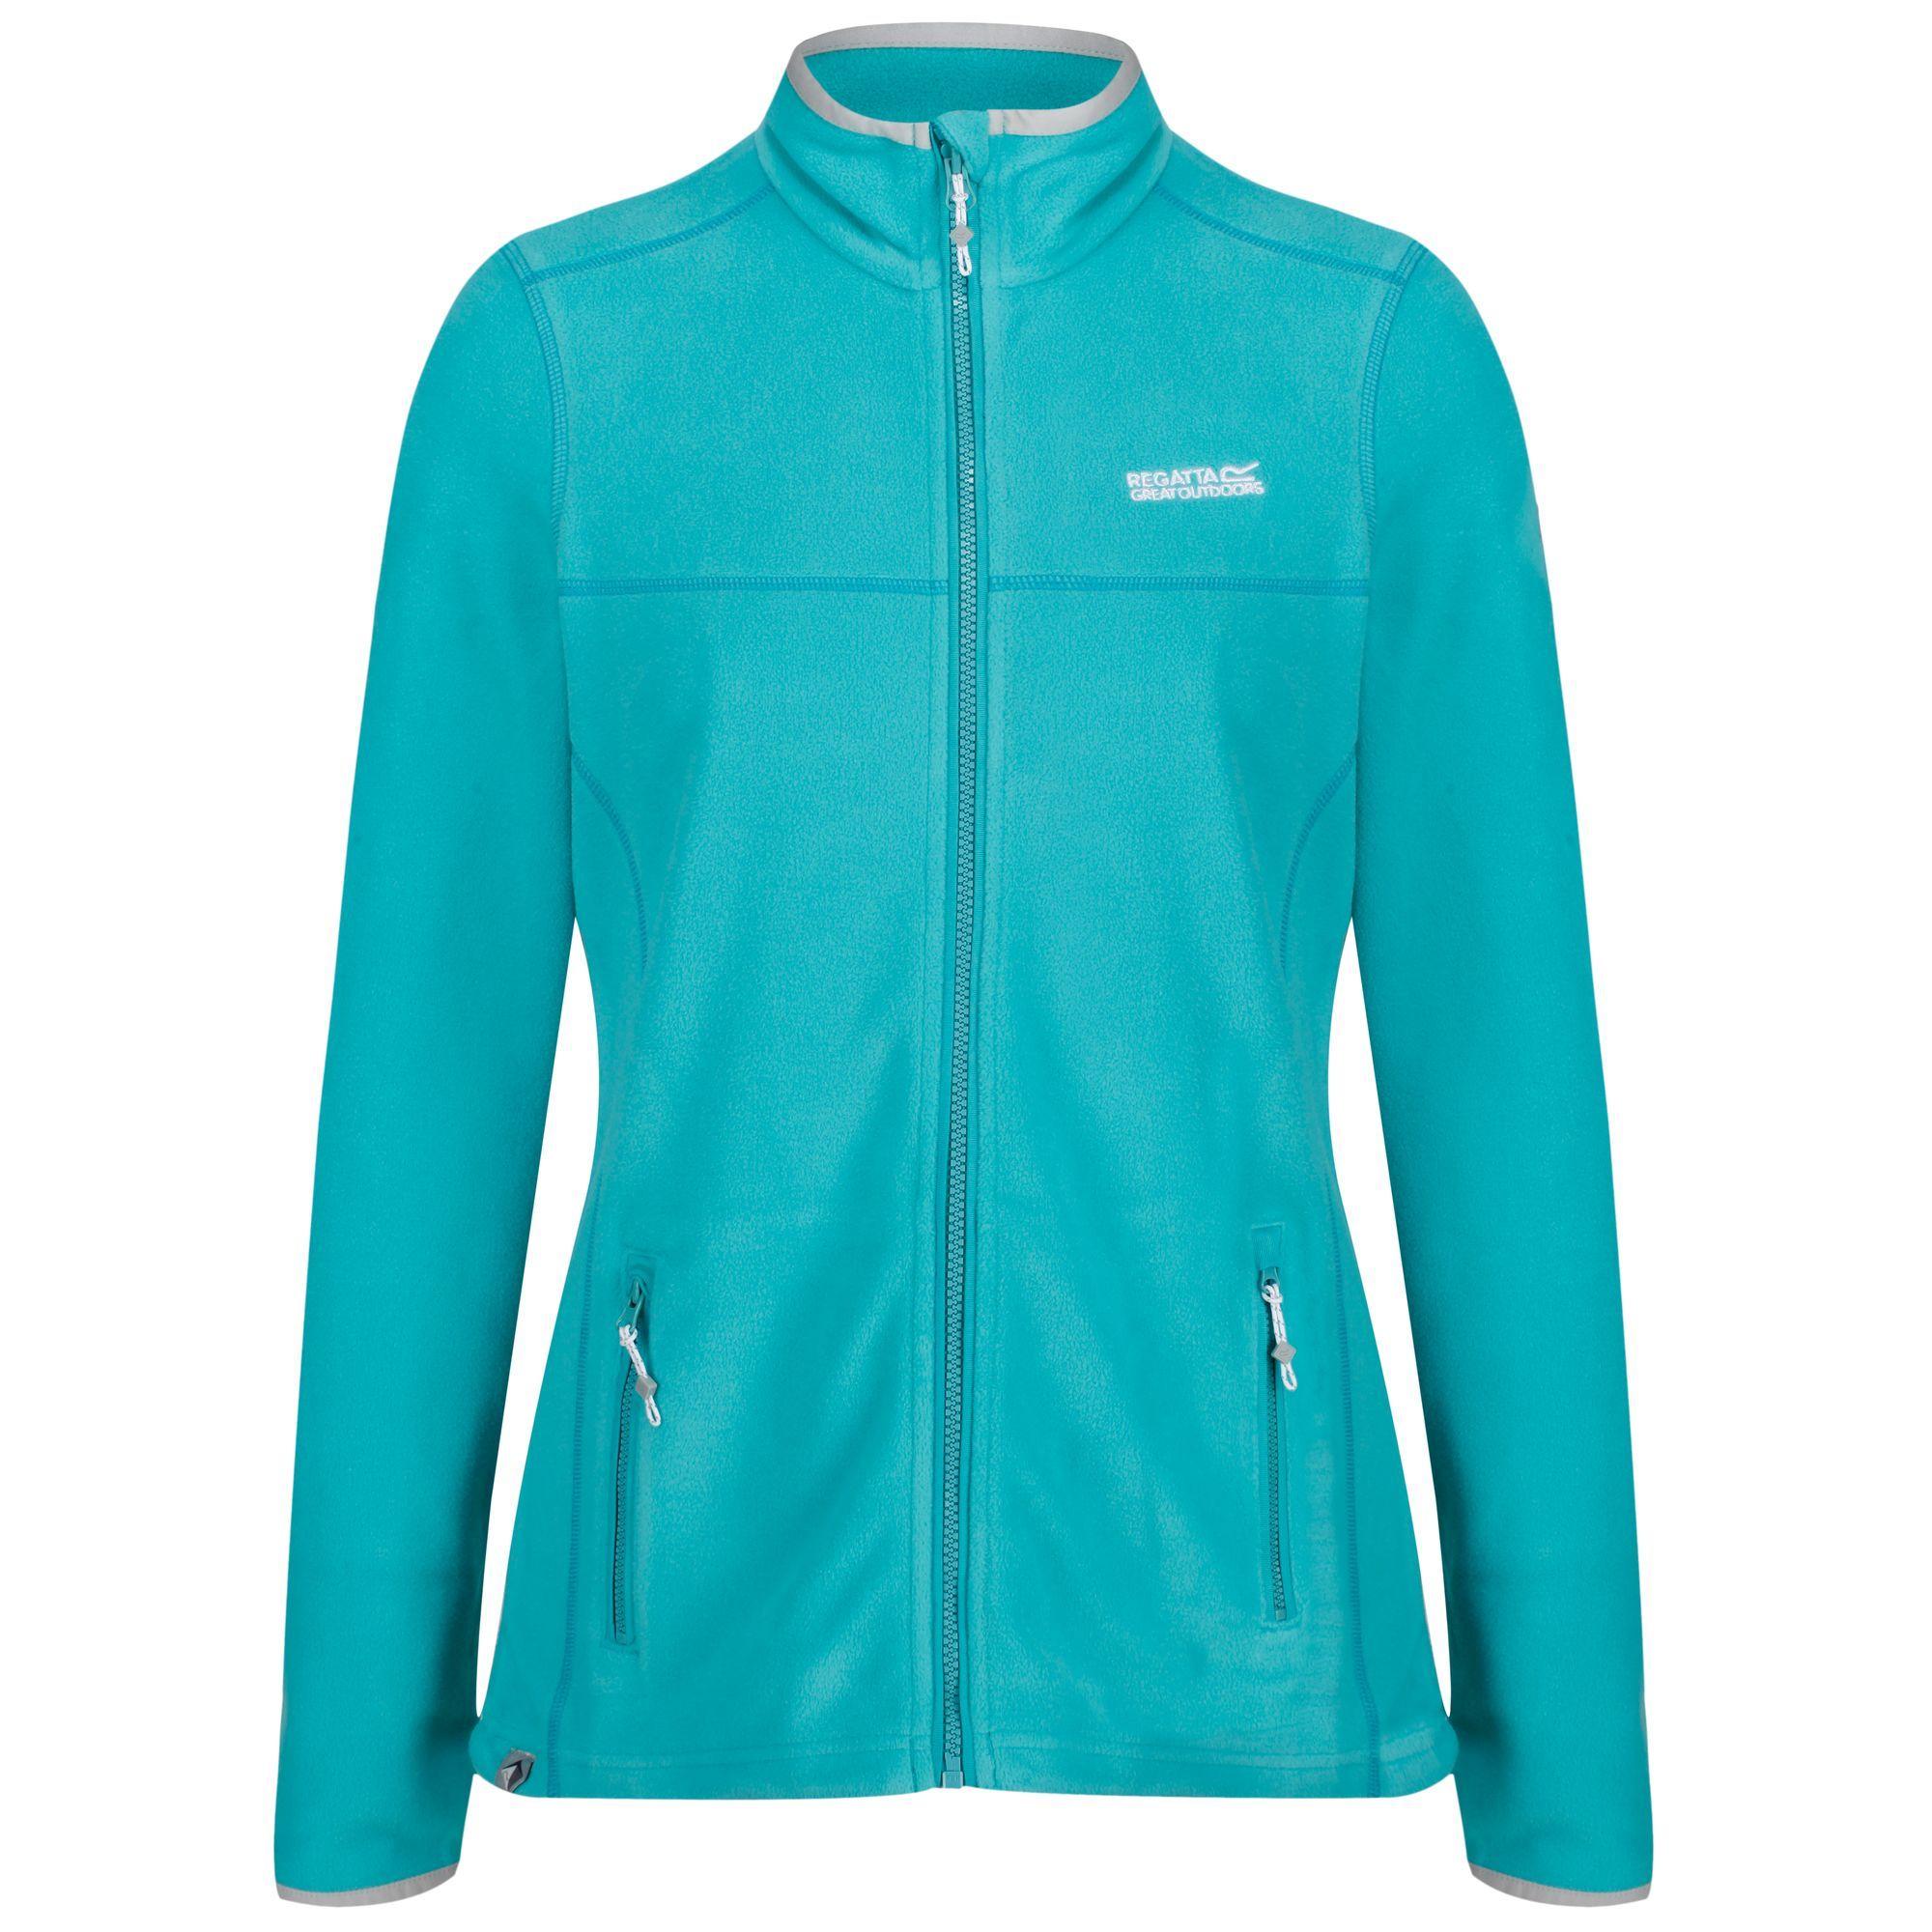 Regatta Great Outdoors Womens/Ladies Floreo II Full Zip Fleece Jacket